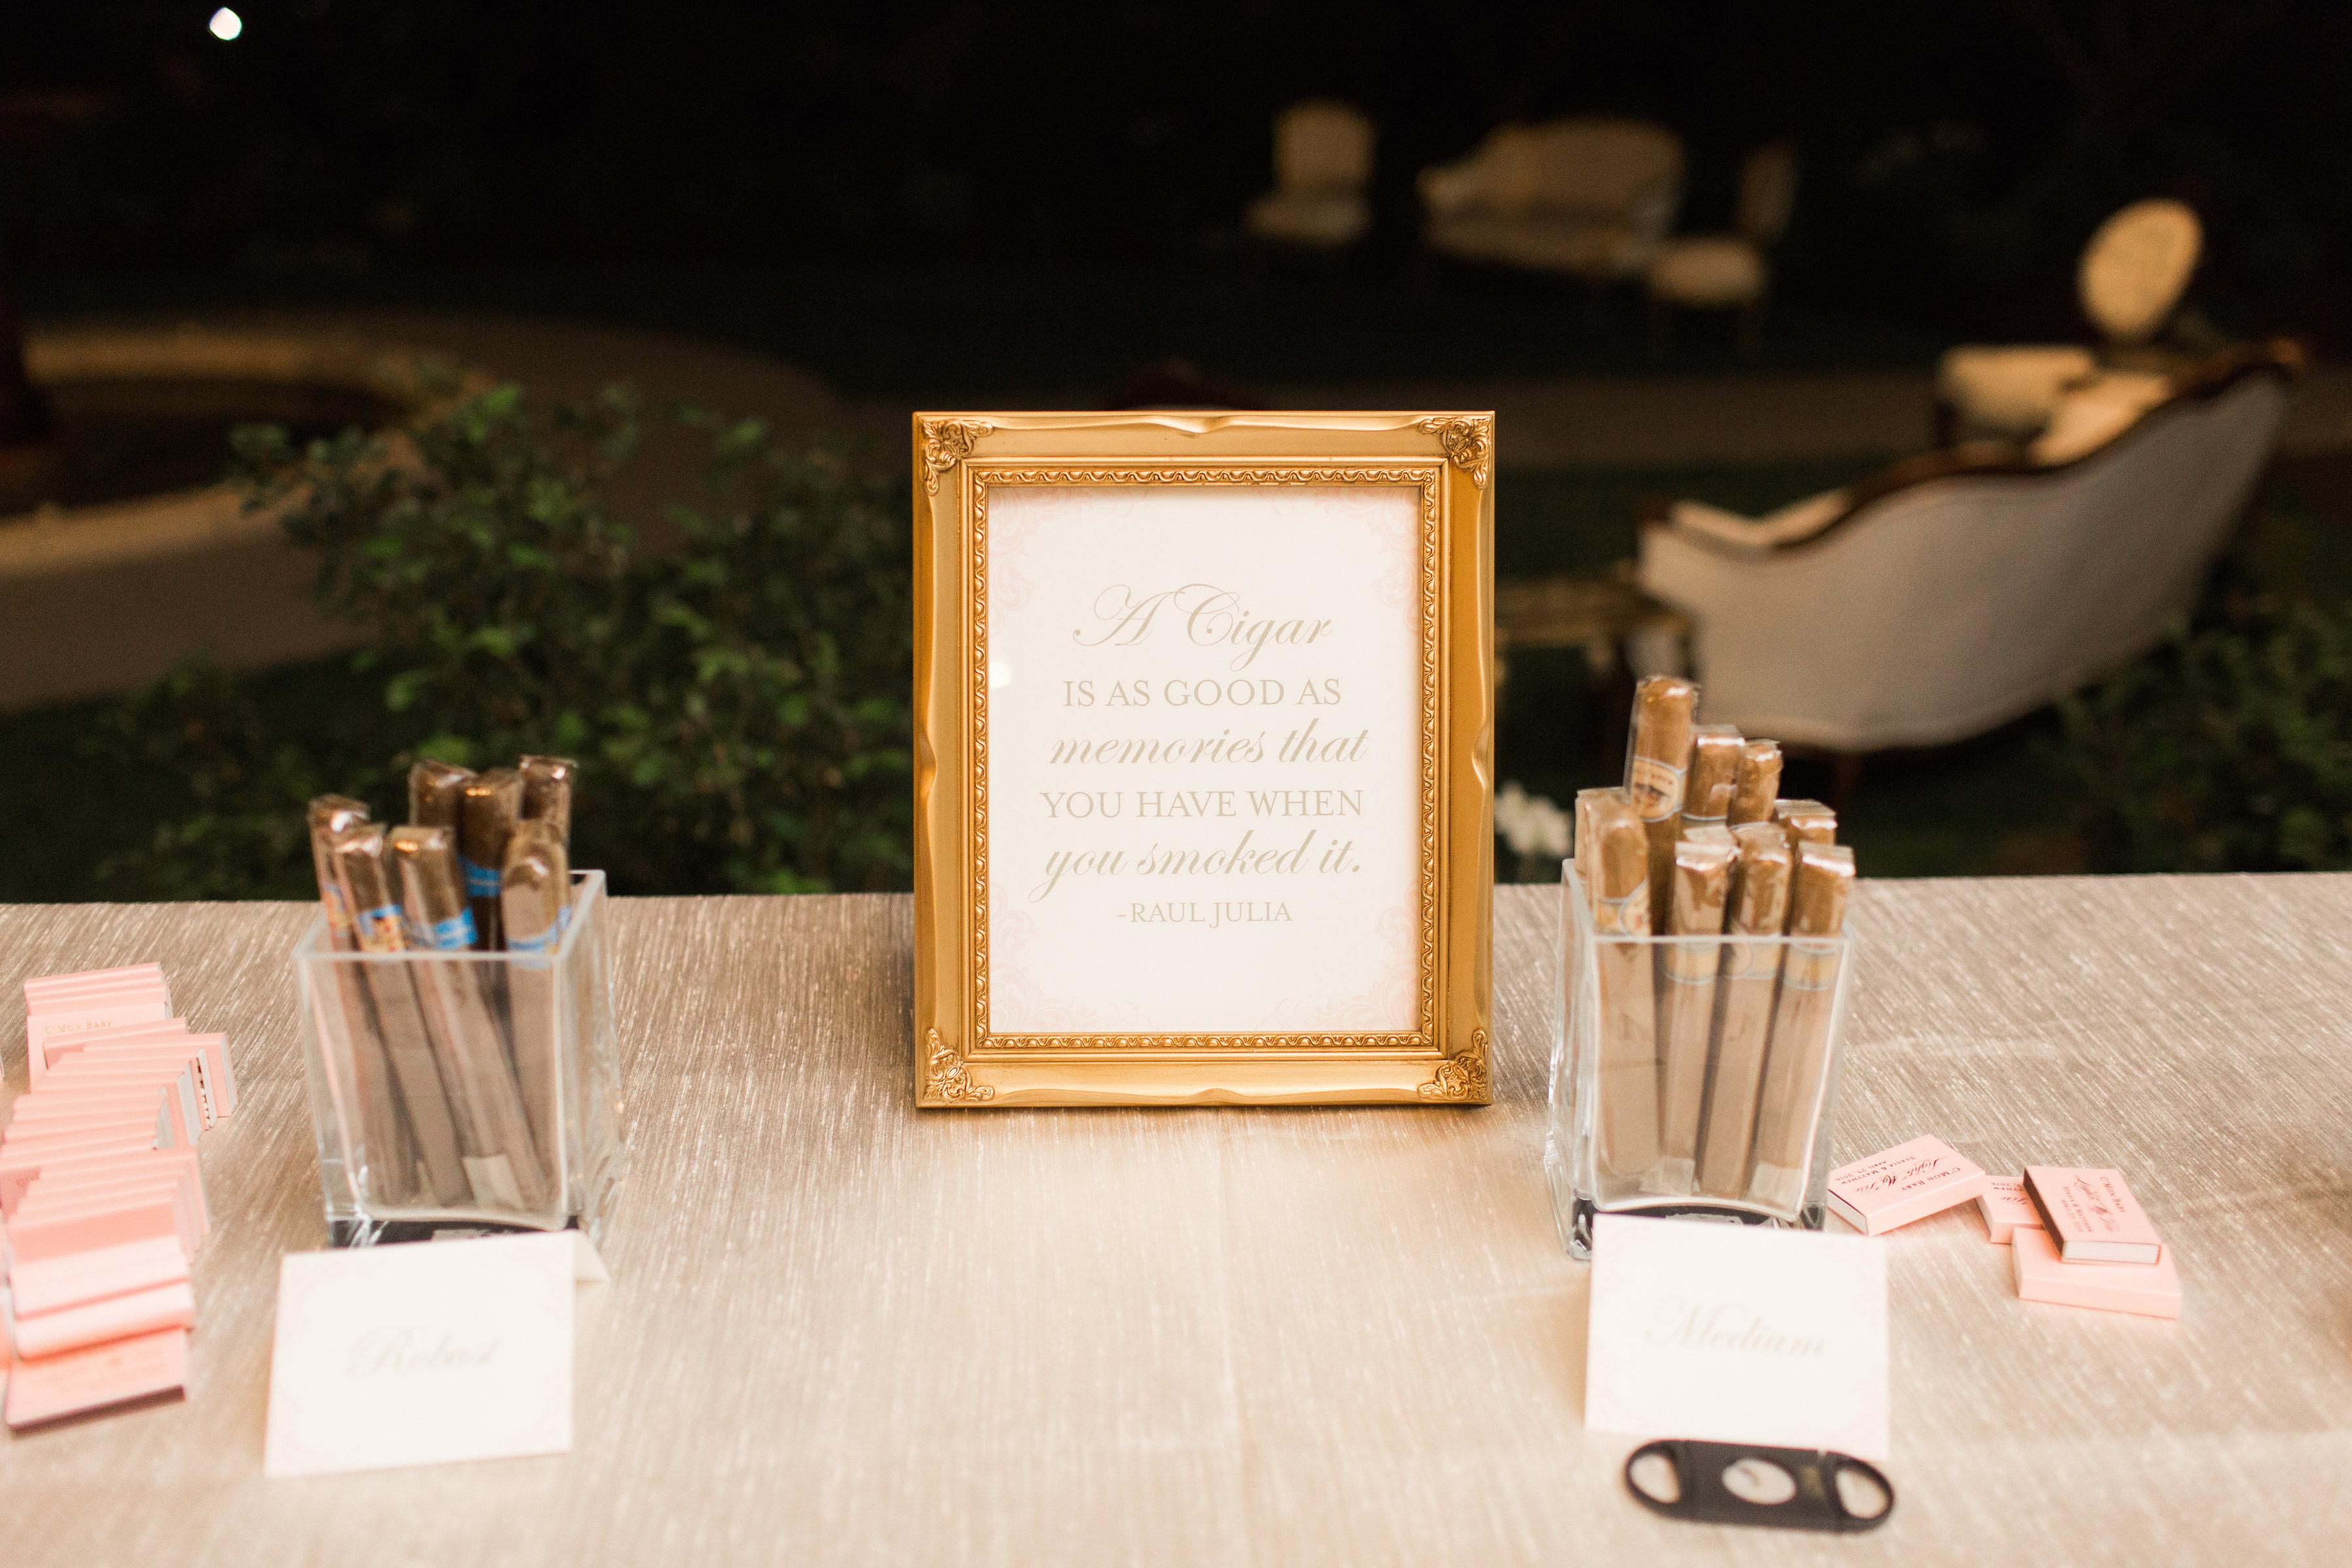 lauren_fair_photography_april_lynn_designs_stasia_matt_spring_cairnwood_estate_wedding_northeast_philadelphia_blush_pink_gold_wedding_invitation_stationery_0187